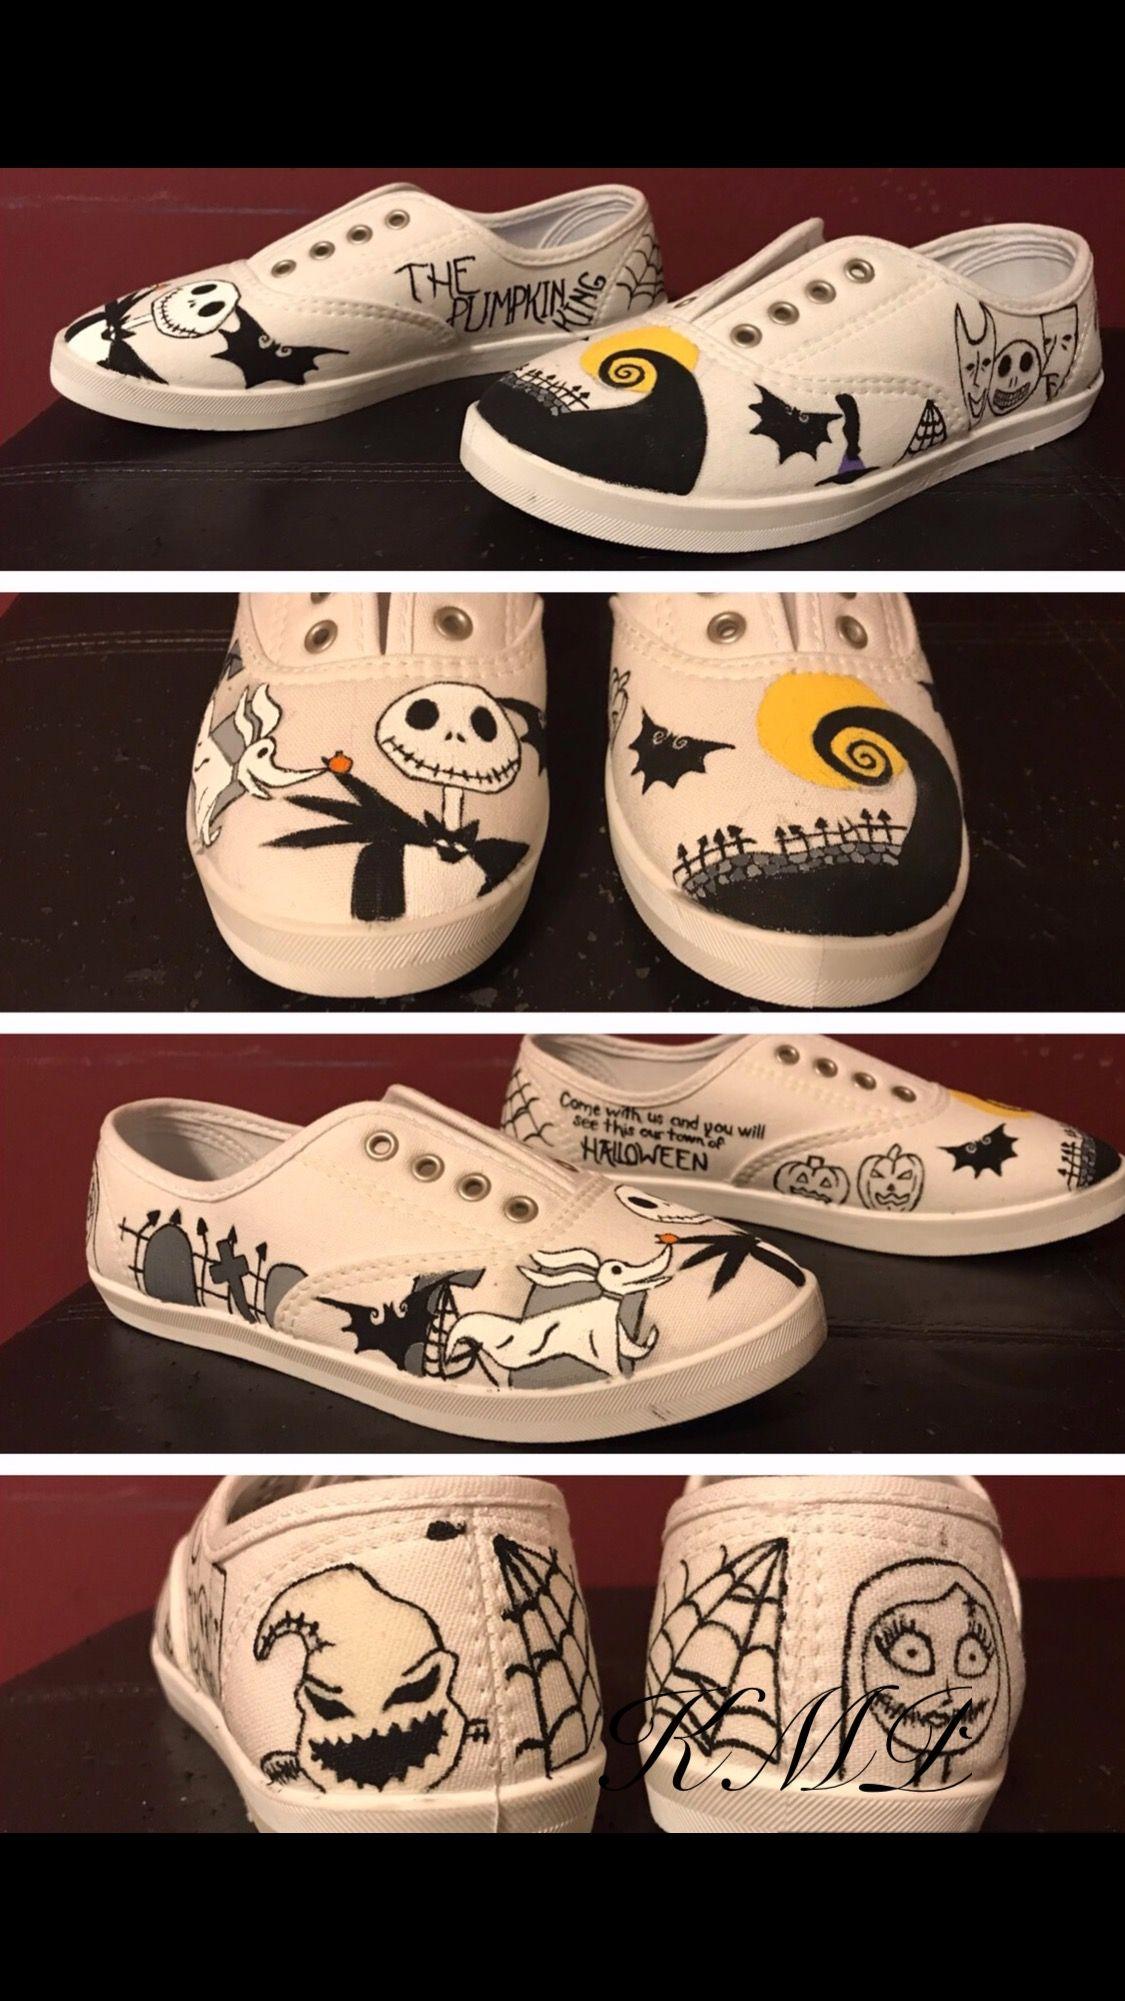 Nightmare Before Christmas Shoes Diy.Pin On Nightmare Before Christmas Theme